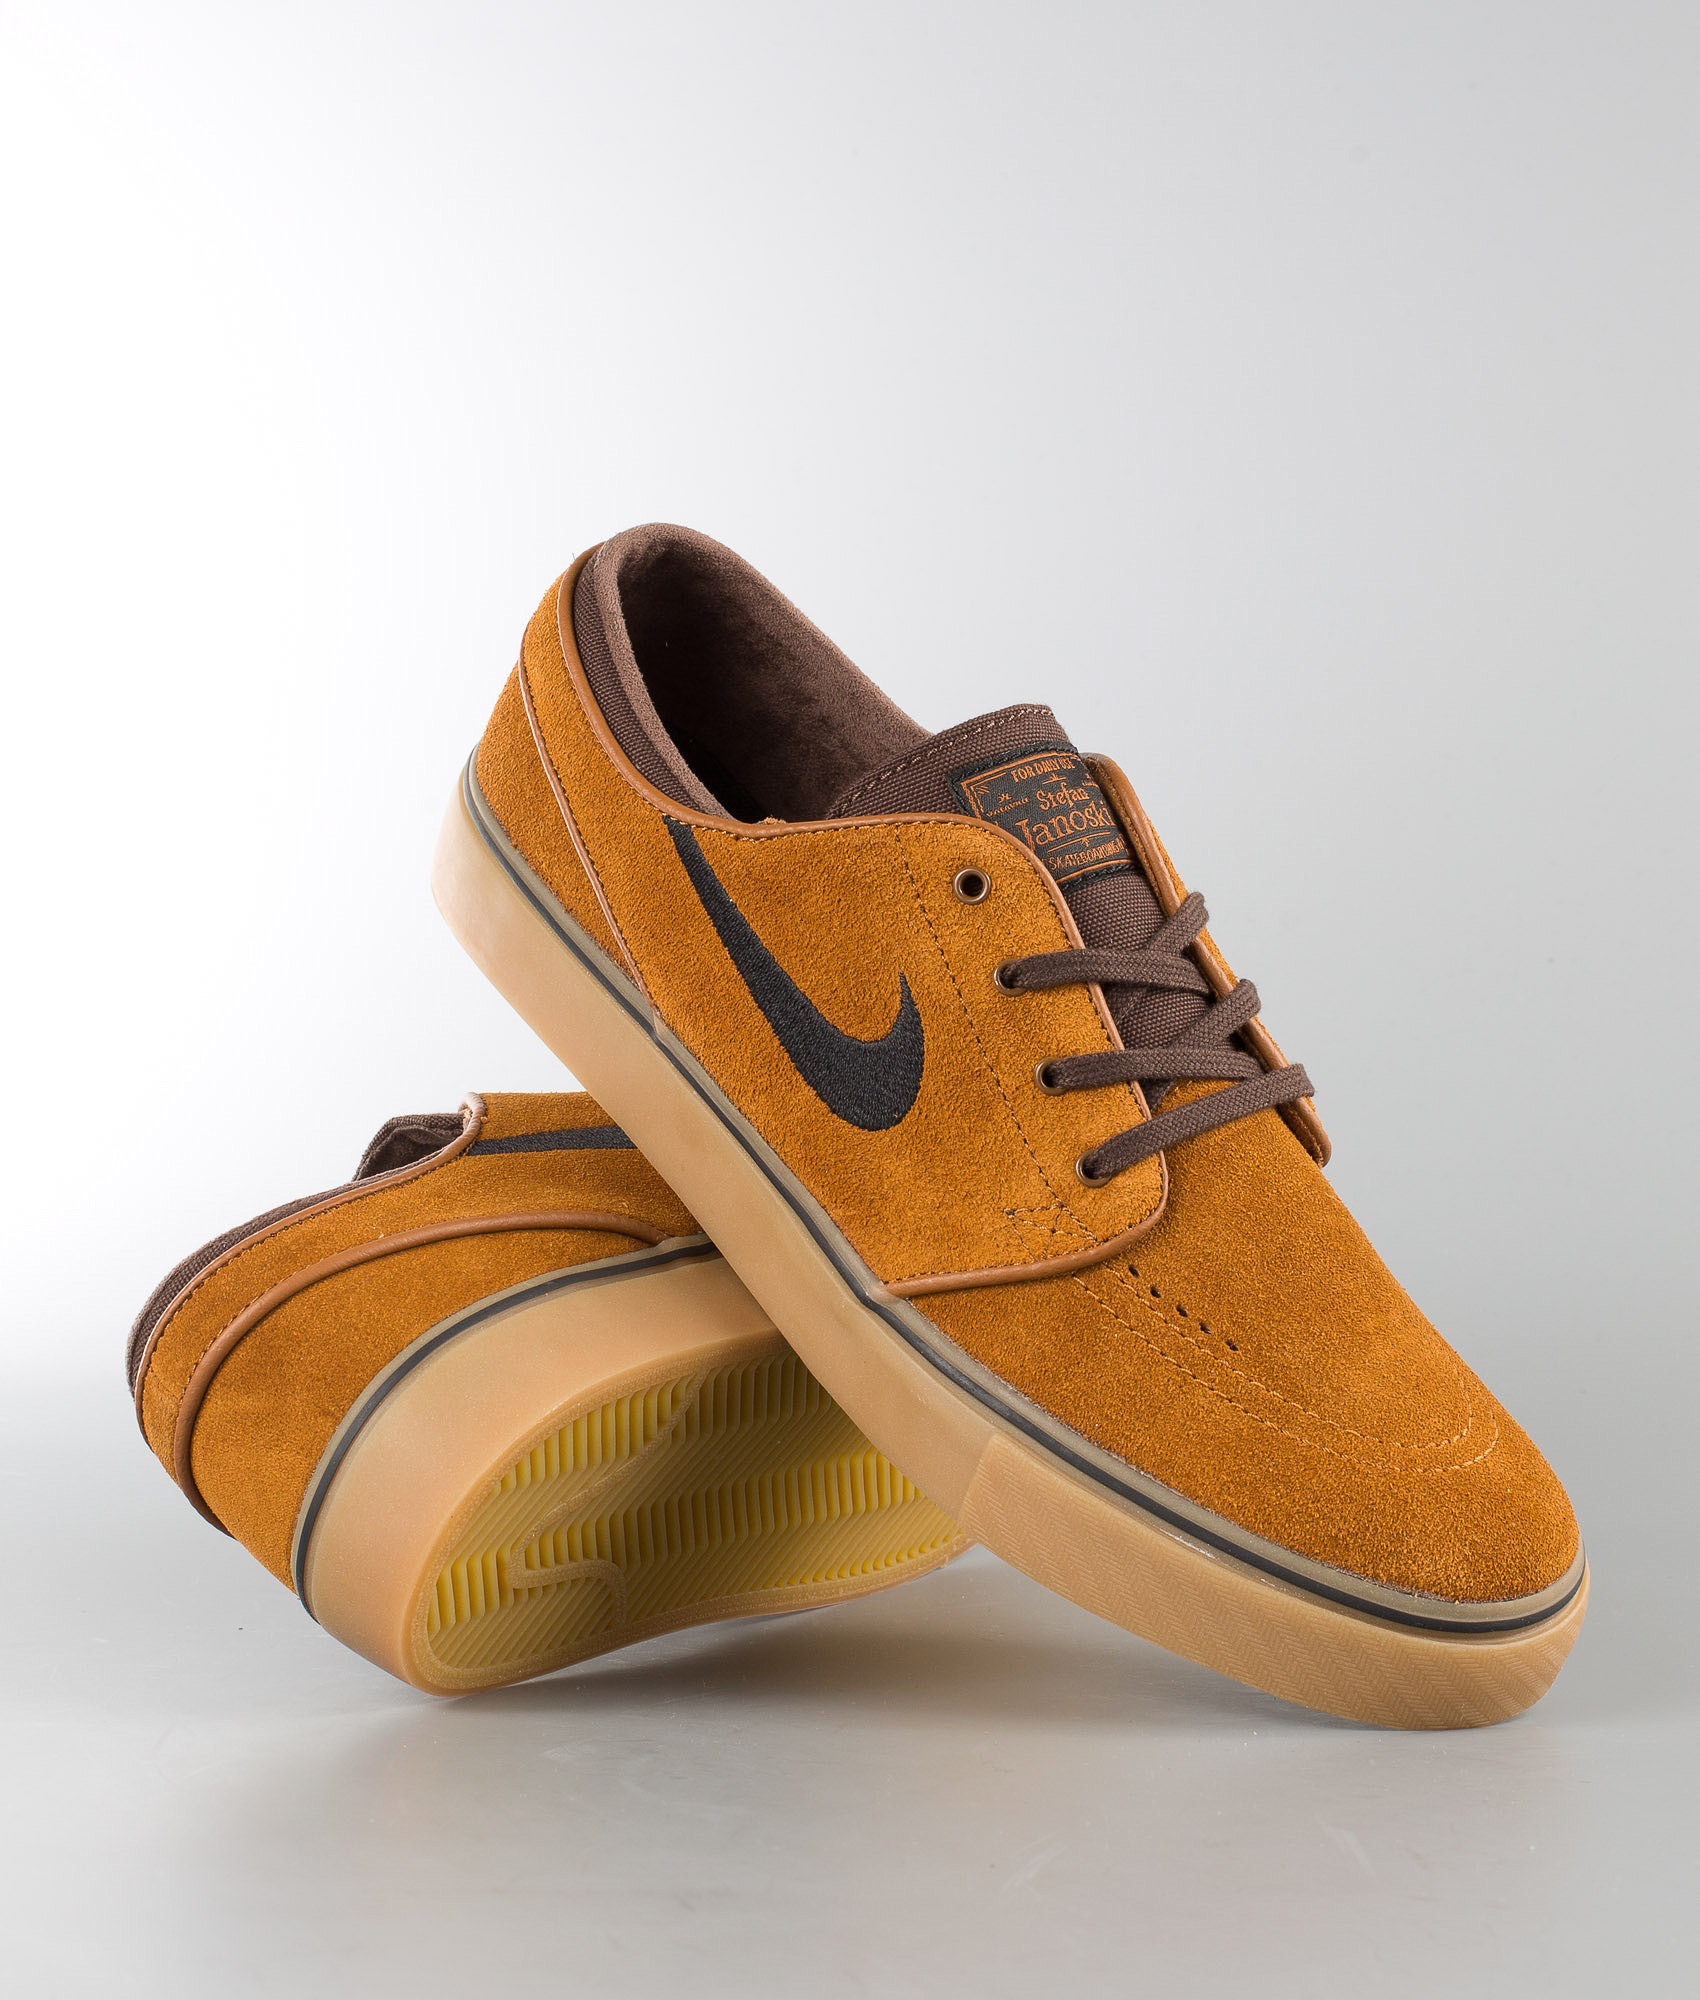 low priced b46af 759ce Nike Zoom Stefan Janoski Shoes Orange. Hazelnut Black-Baroque Brown